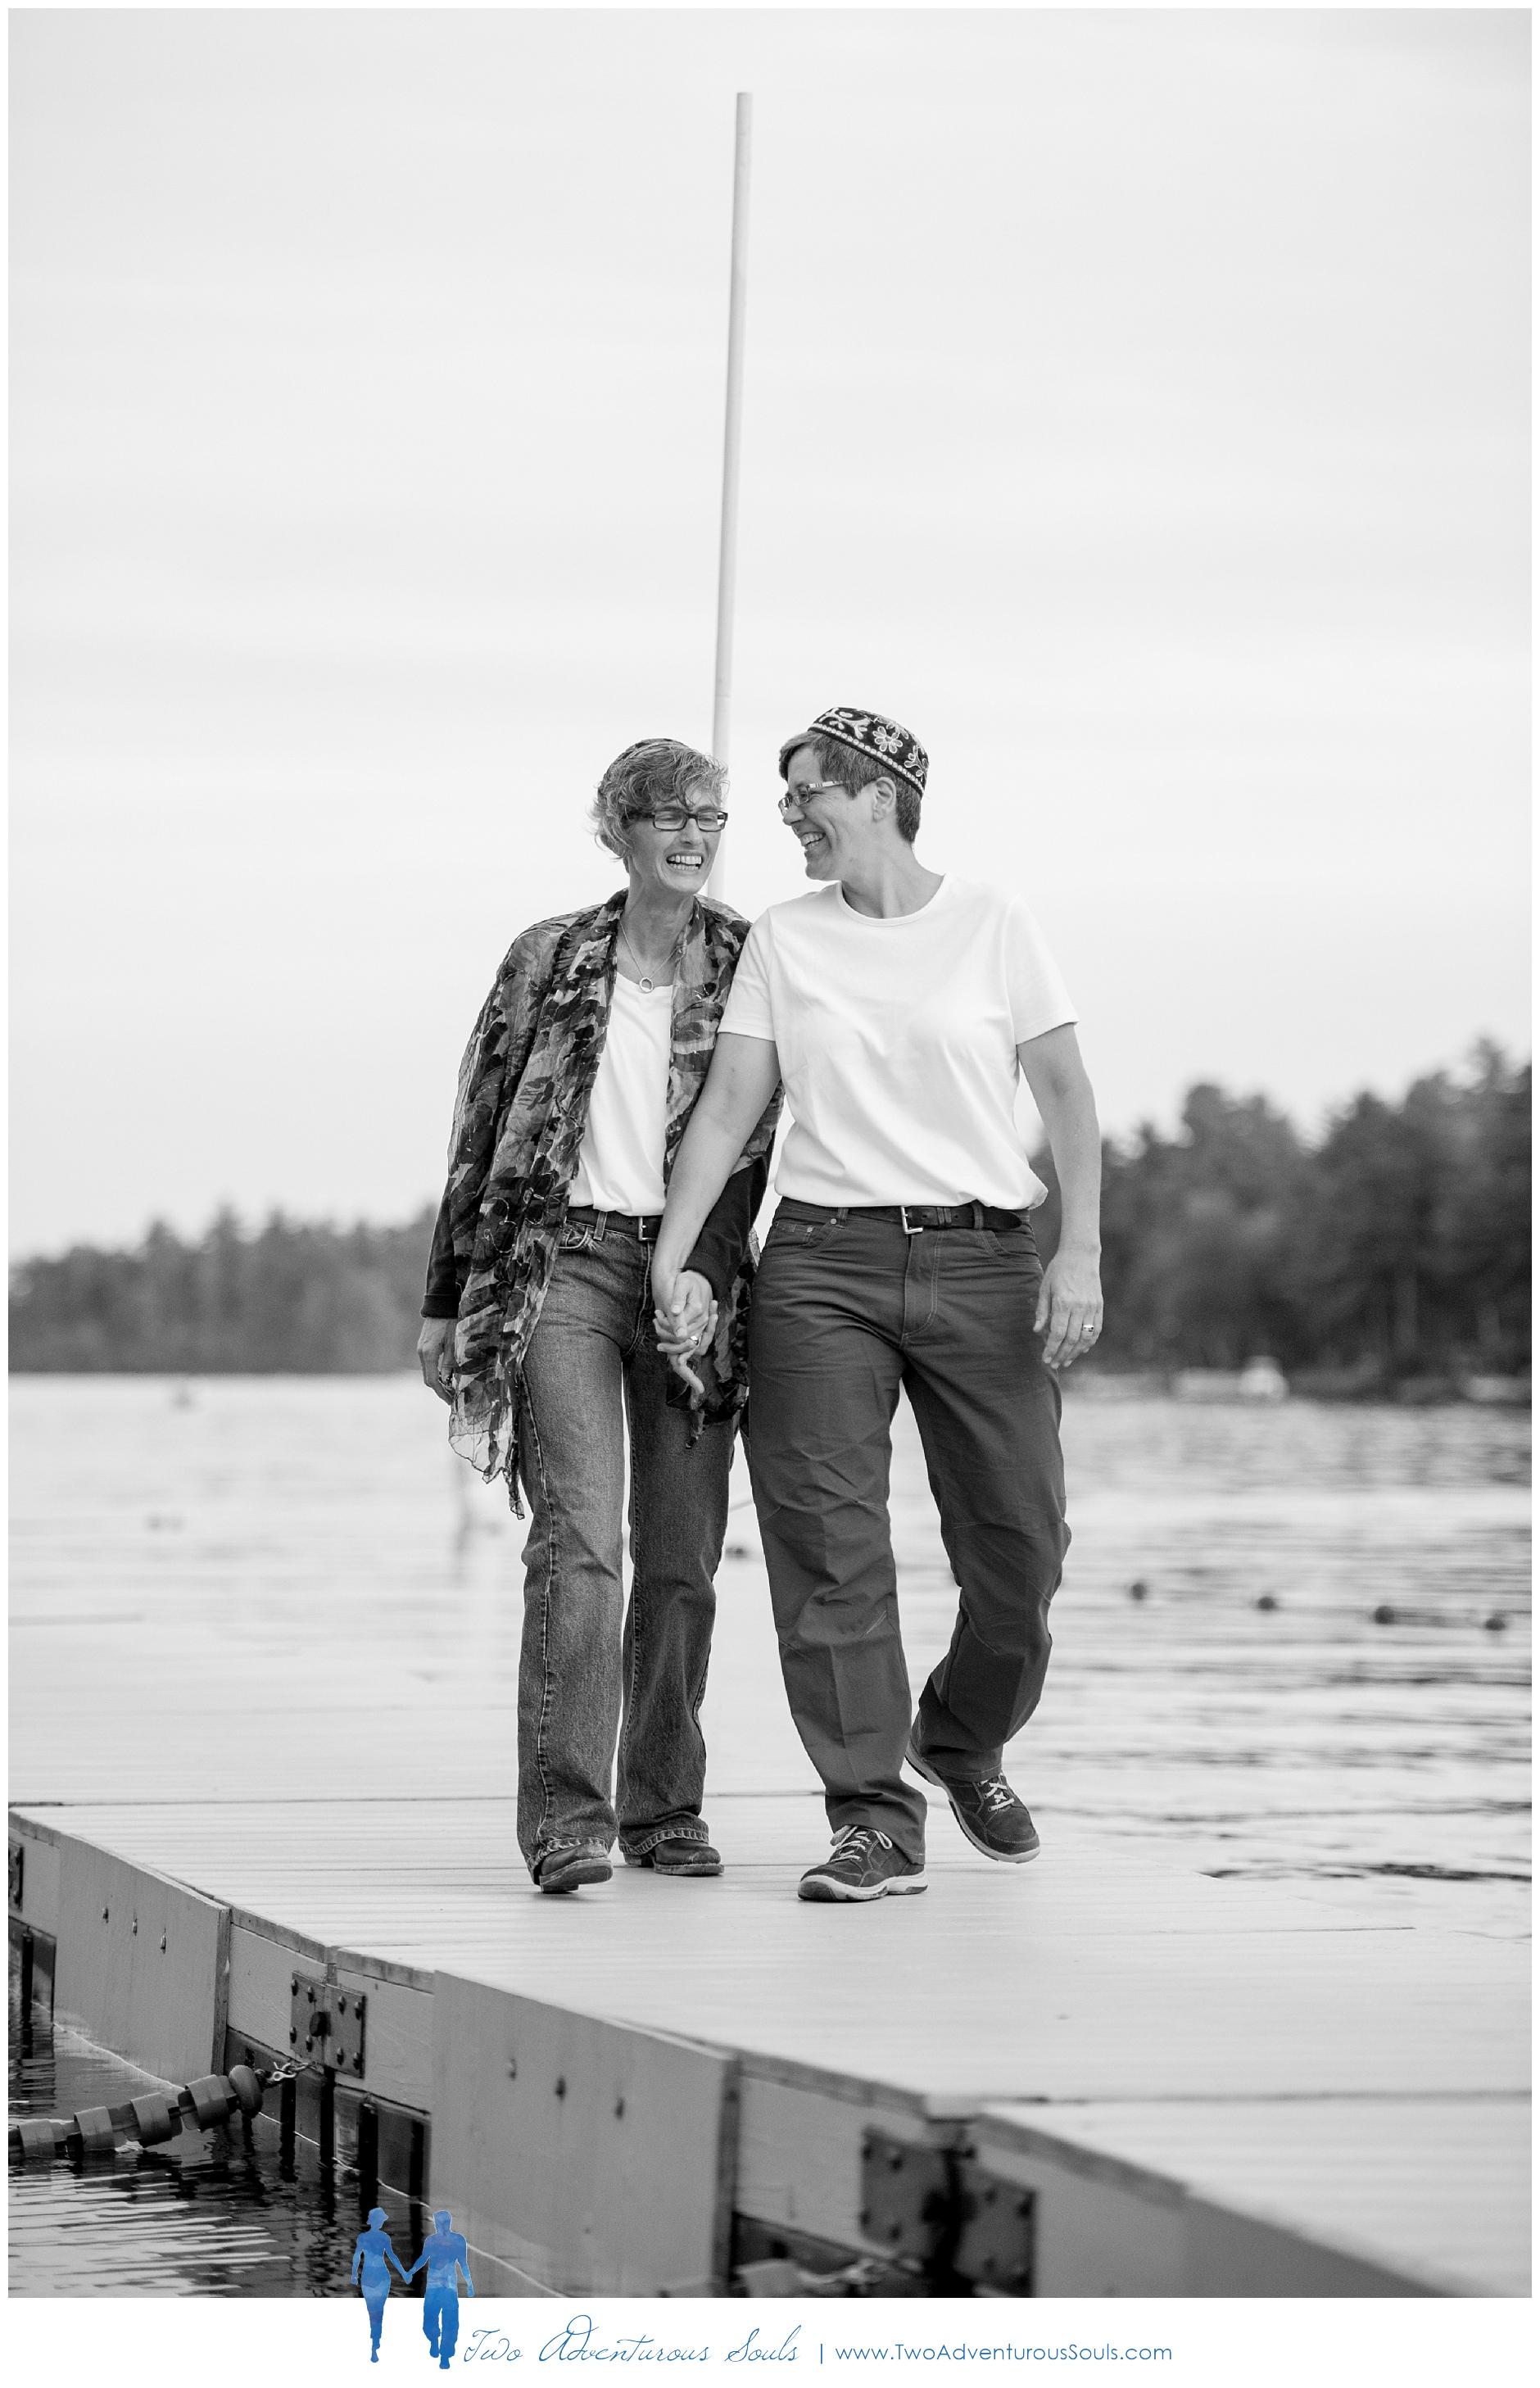 090217-Mindy-Karen-sneaks-81_WEB-Maine-Wedding-and-Portrait-Photographer.jpg